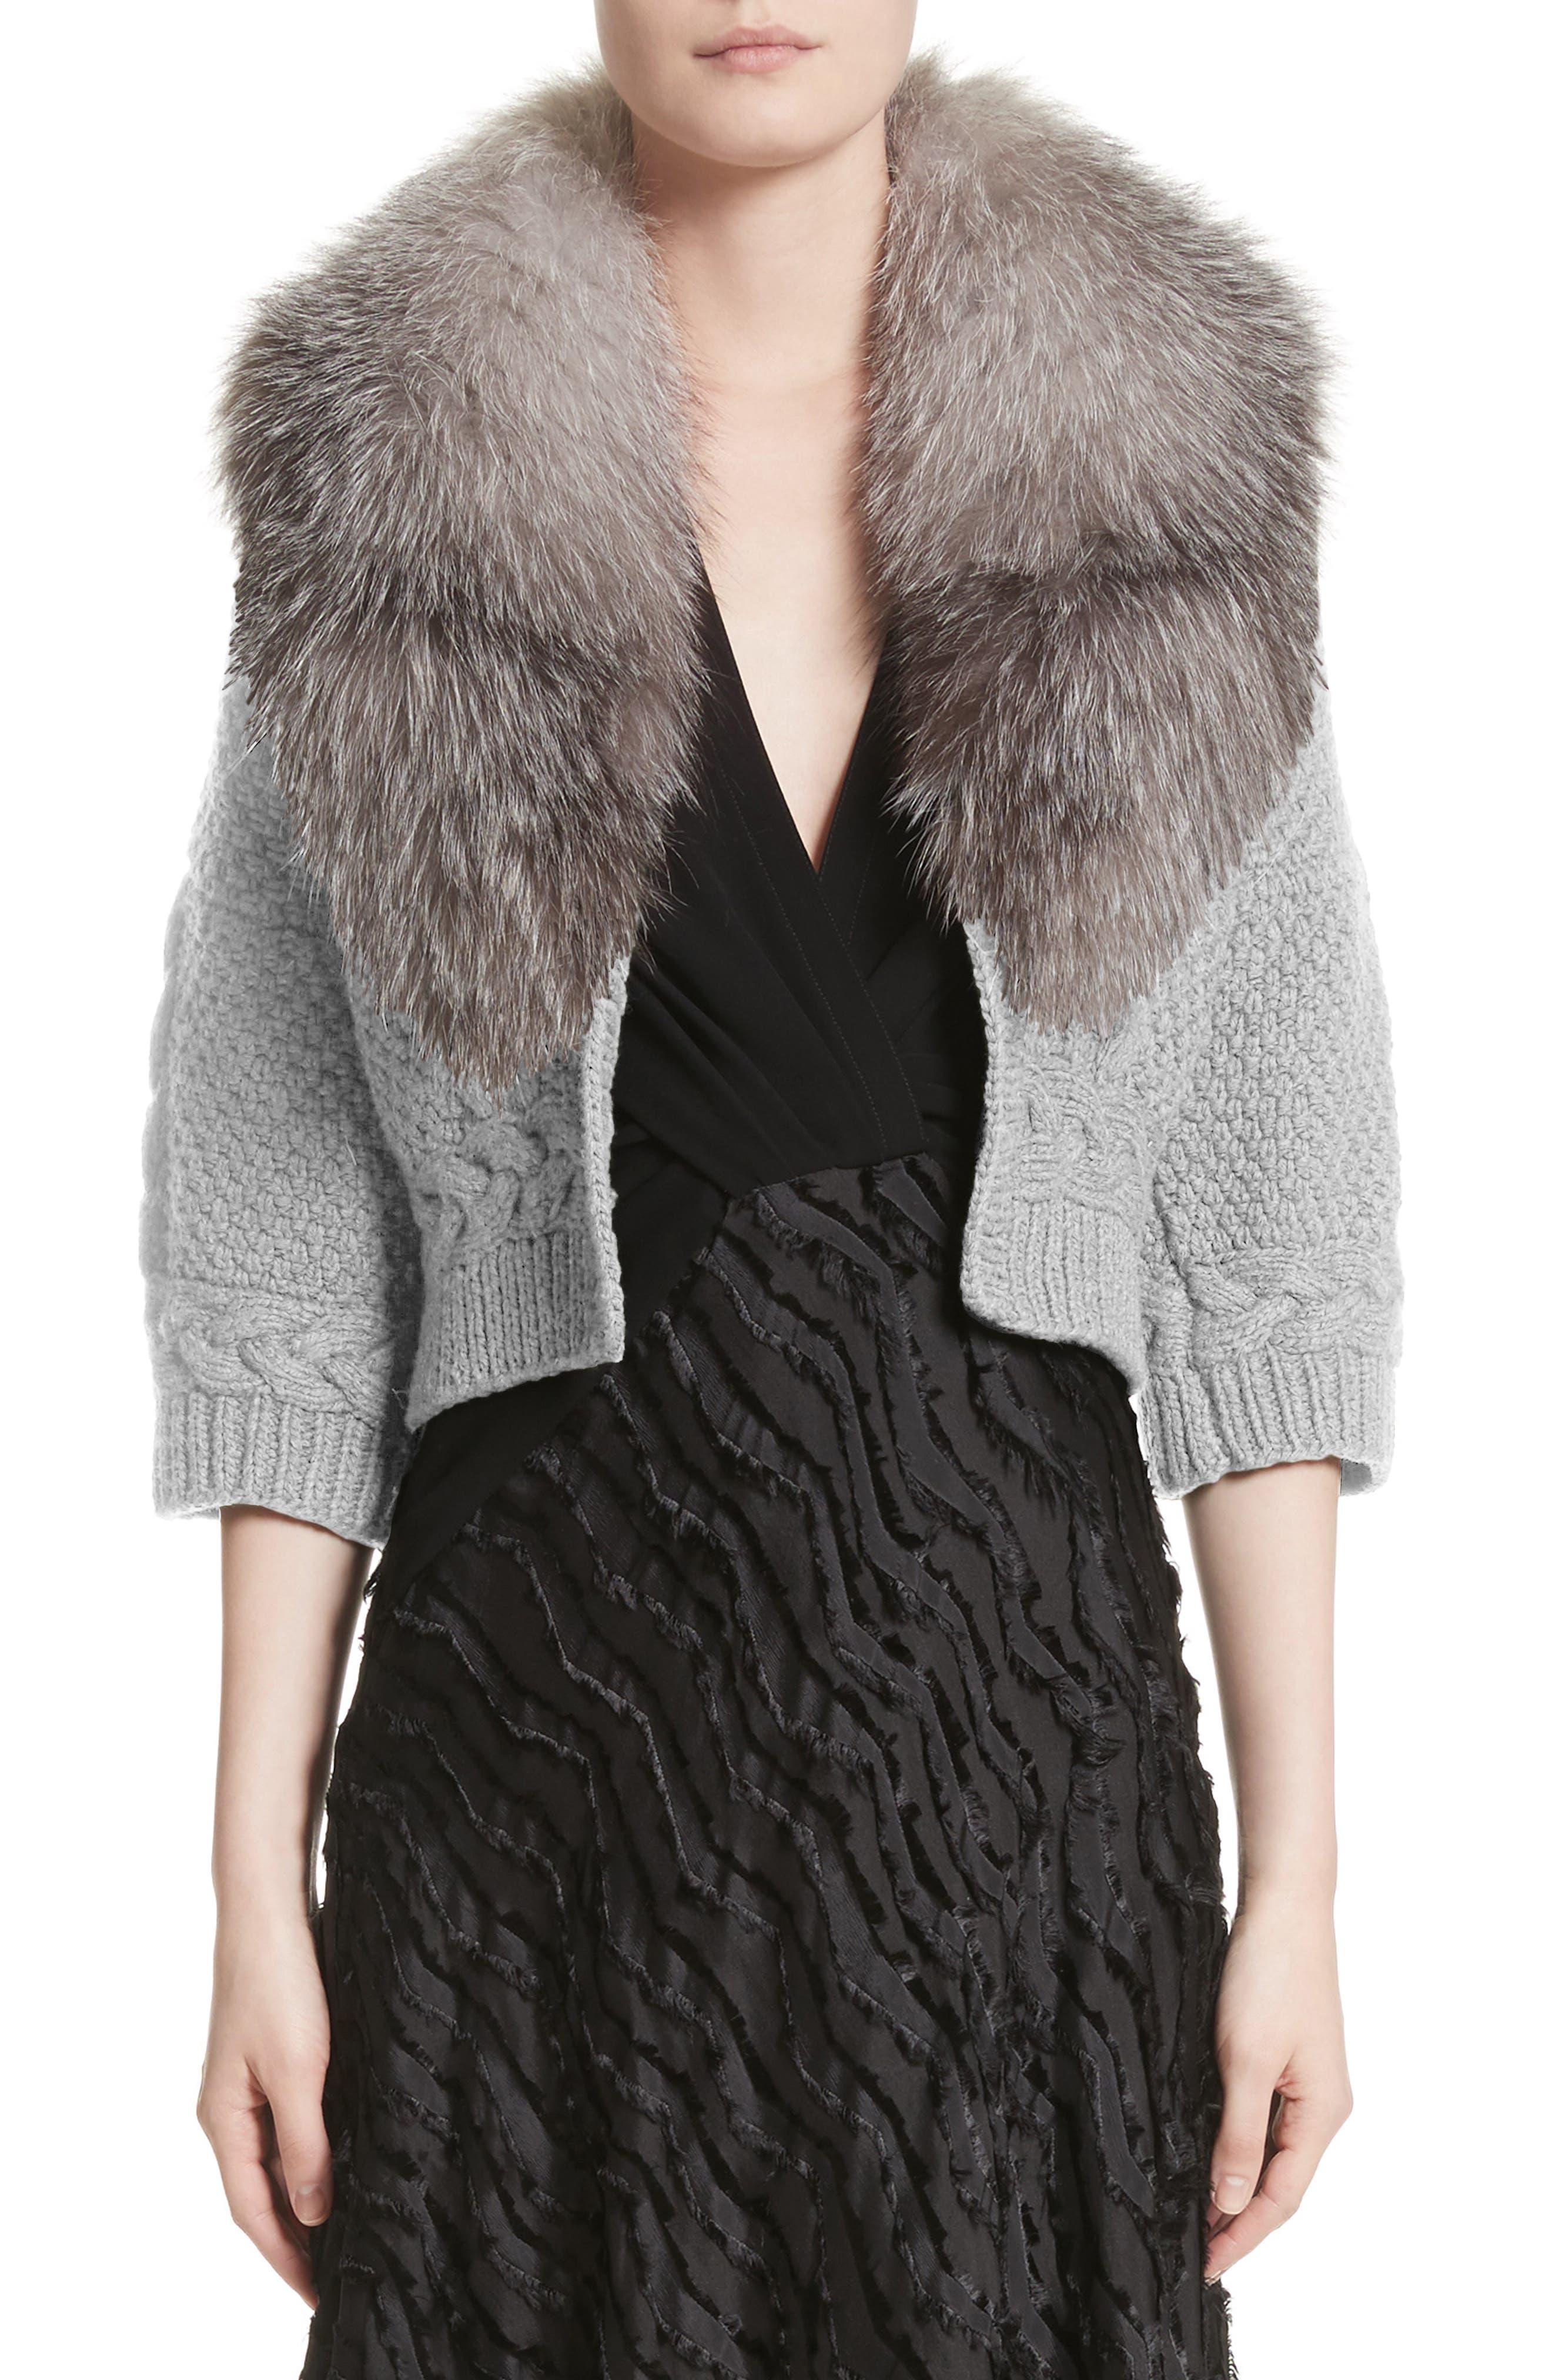 Merino Wool & Cashmere Knit Bolero with Removable Genuine Fox Fur Collar,                             Main thumbnail 1, color,                             087